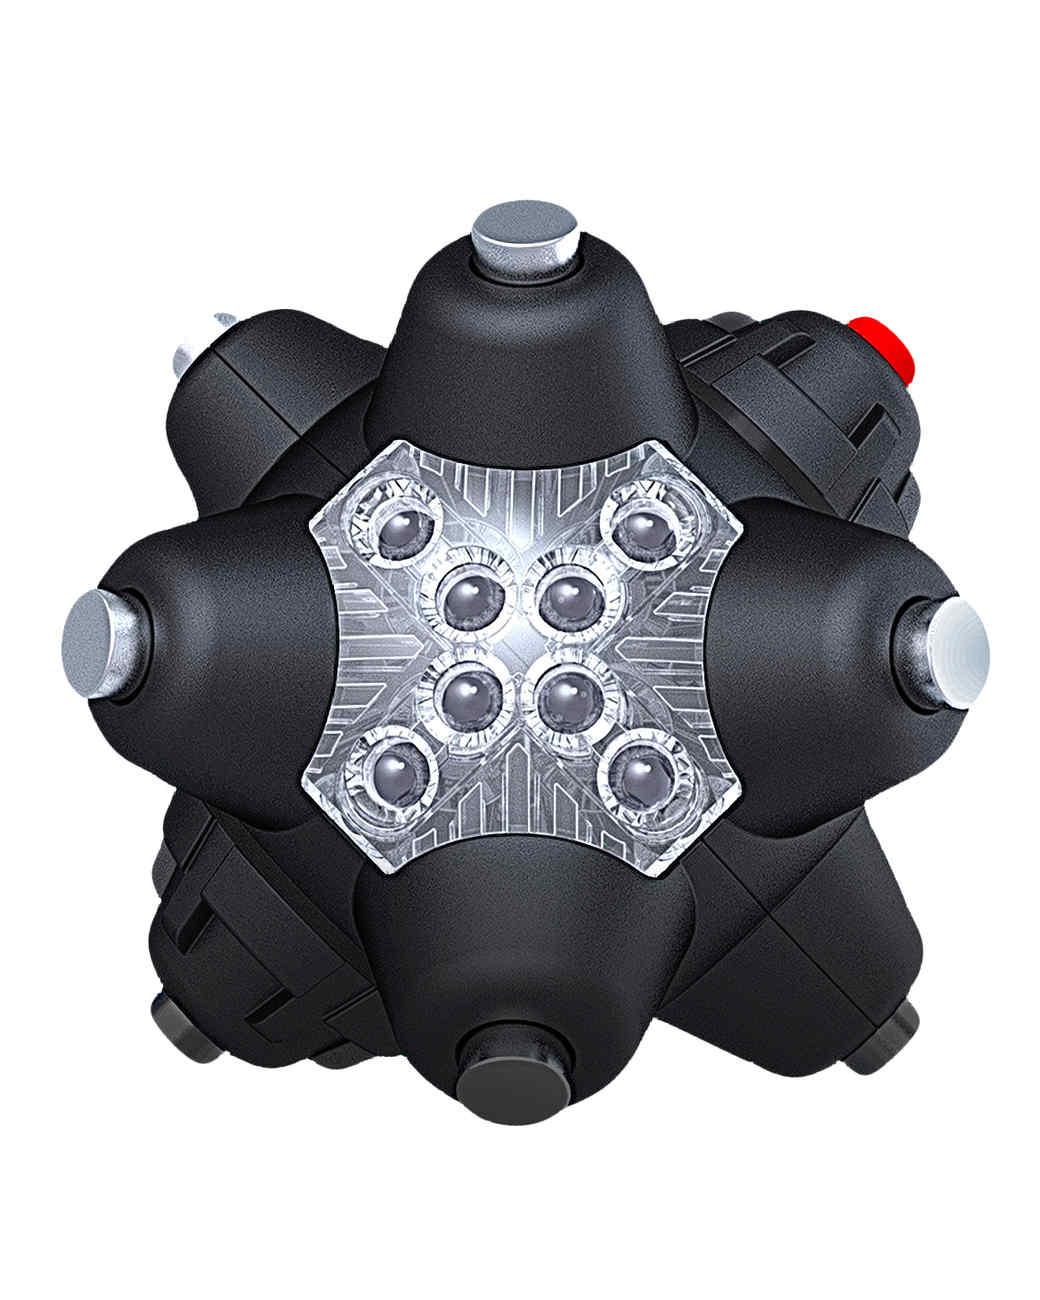 striker-light-mine.jpg